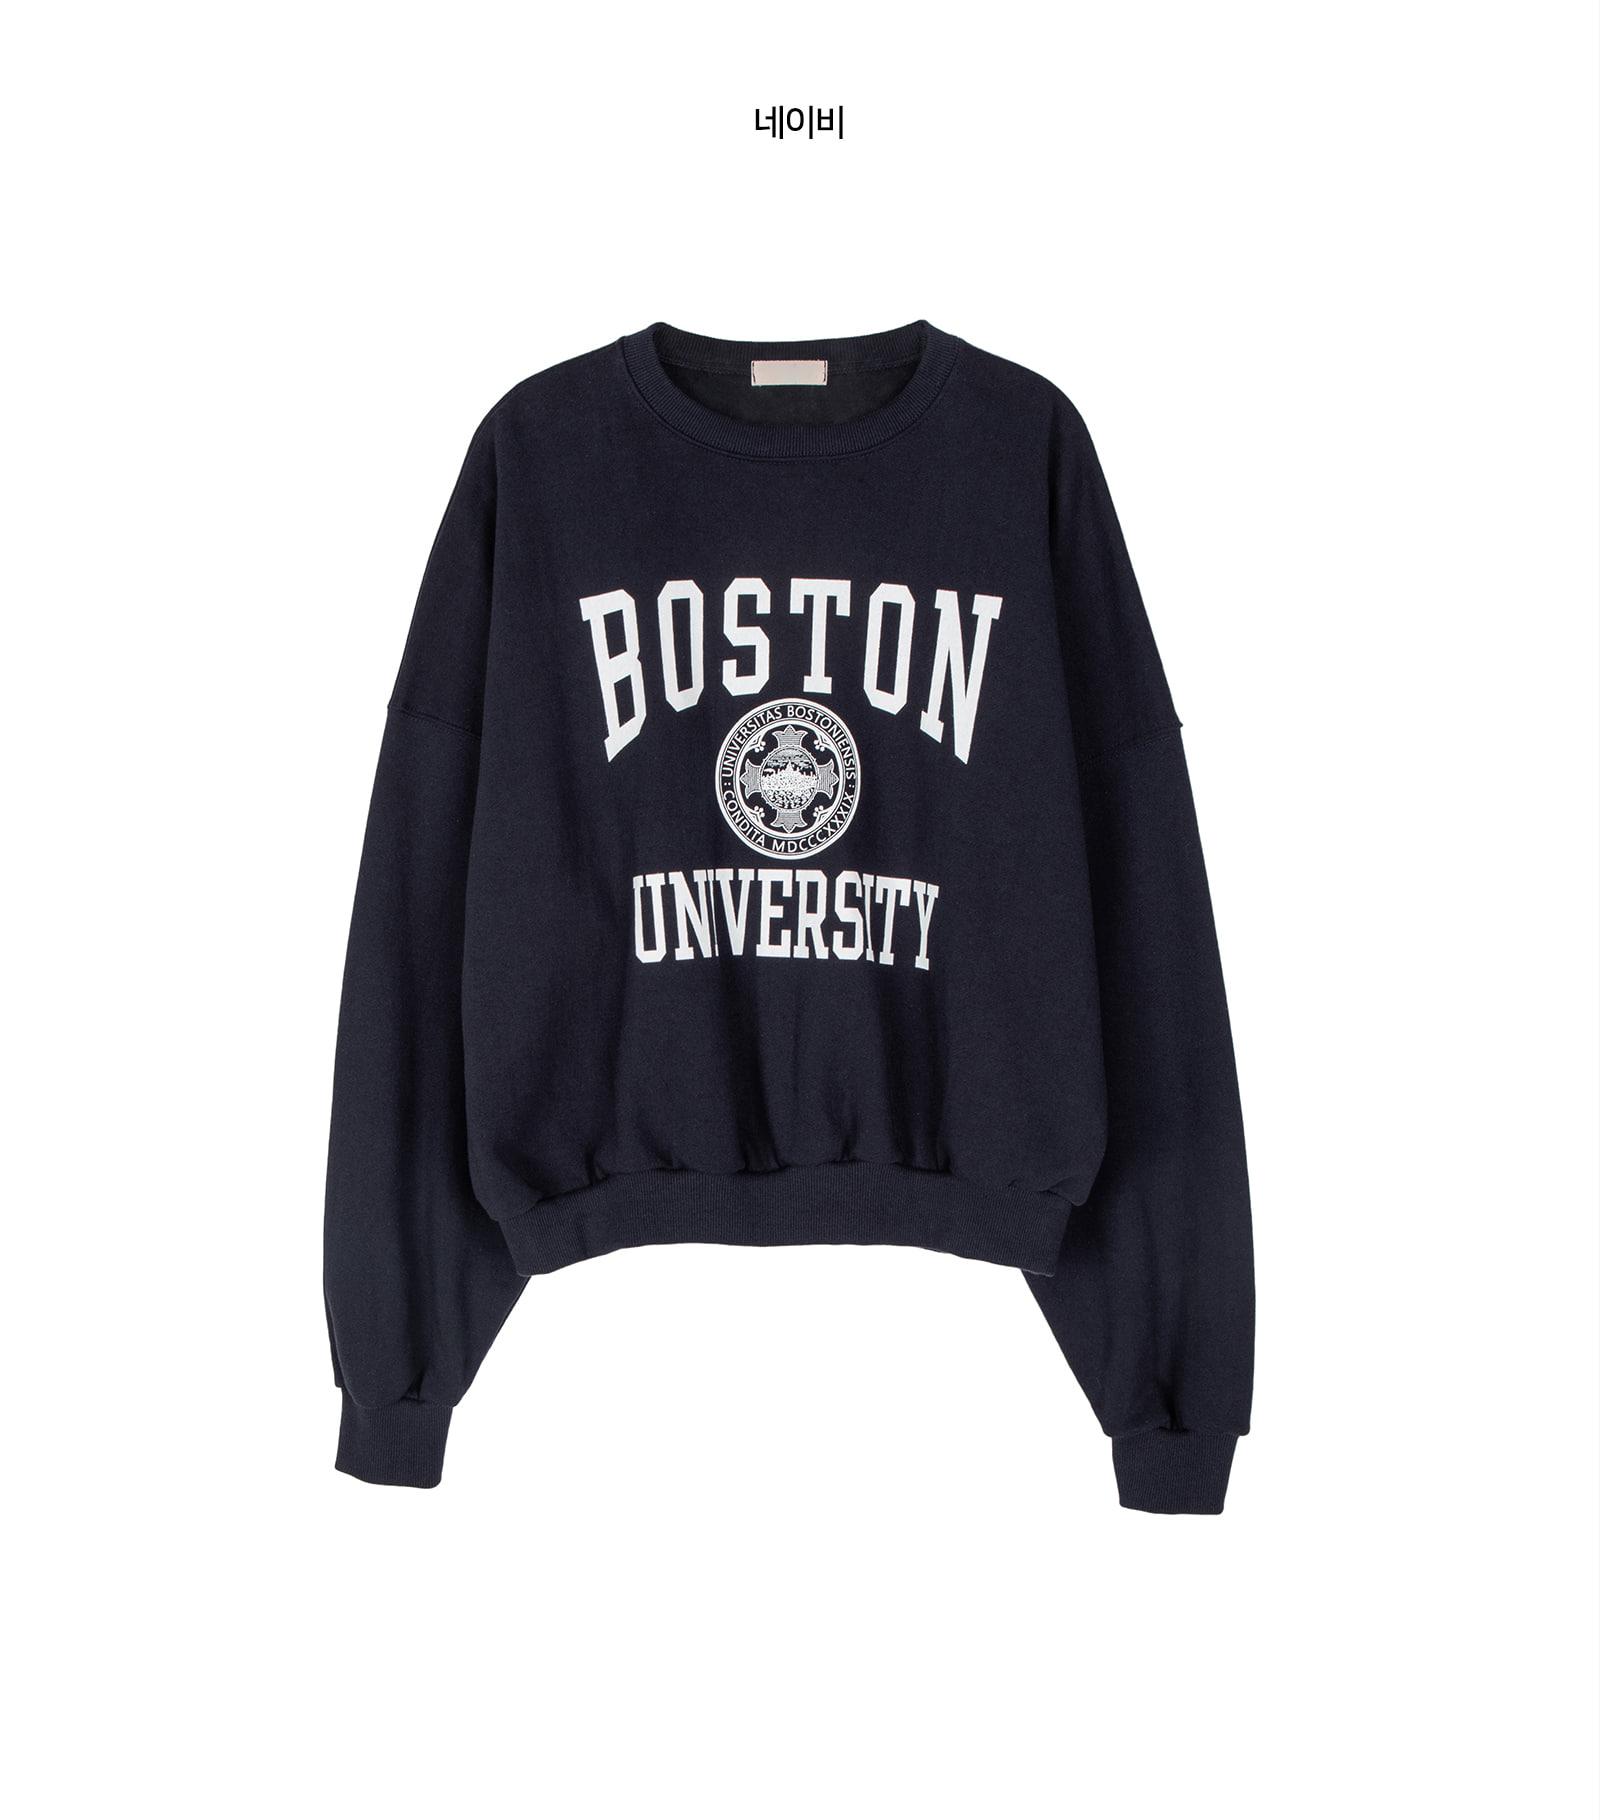 Boston printed crew neck sweatshirt